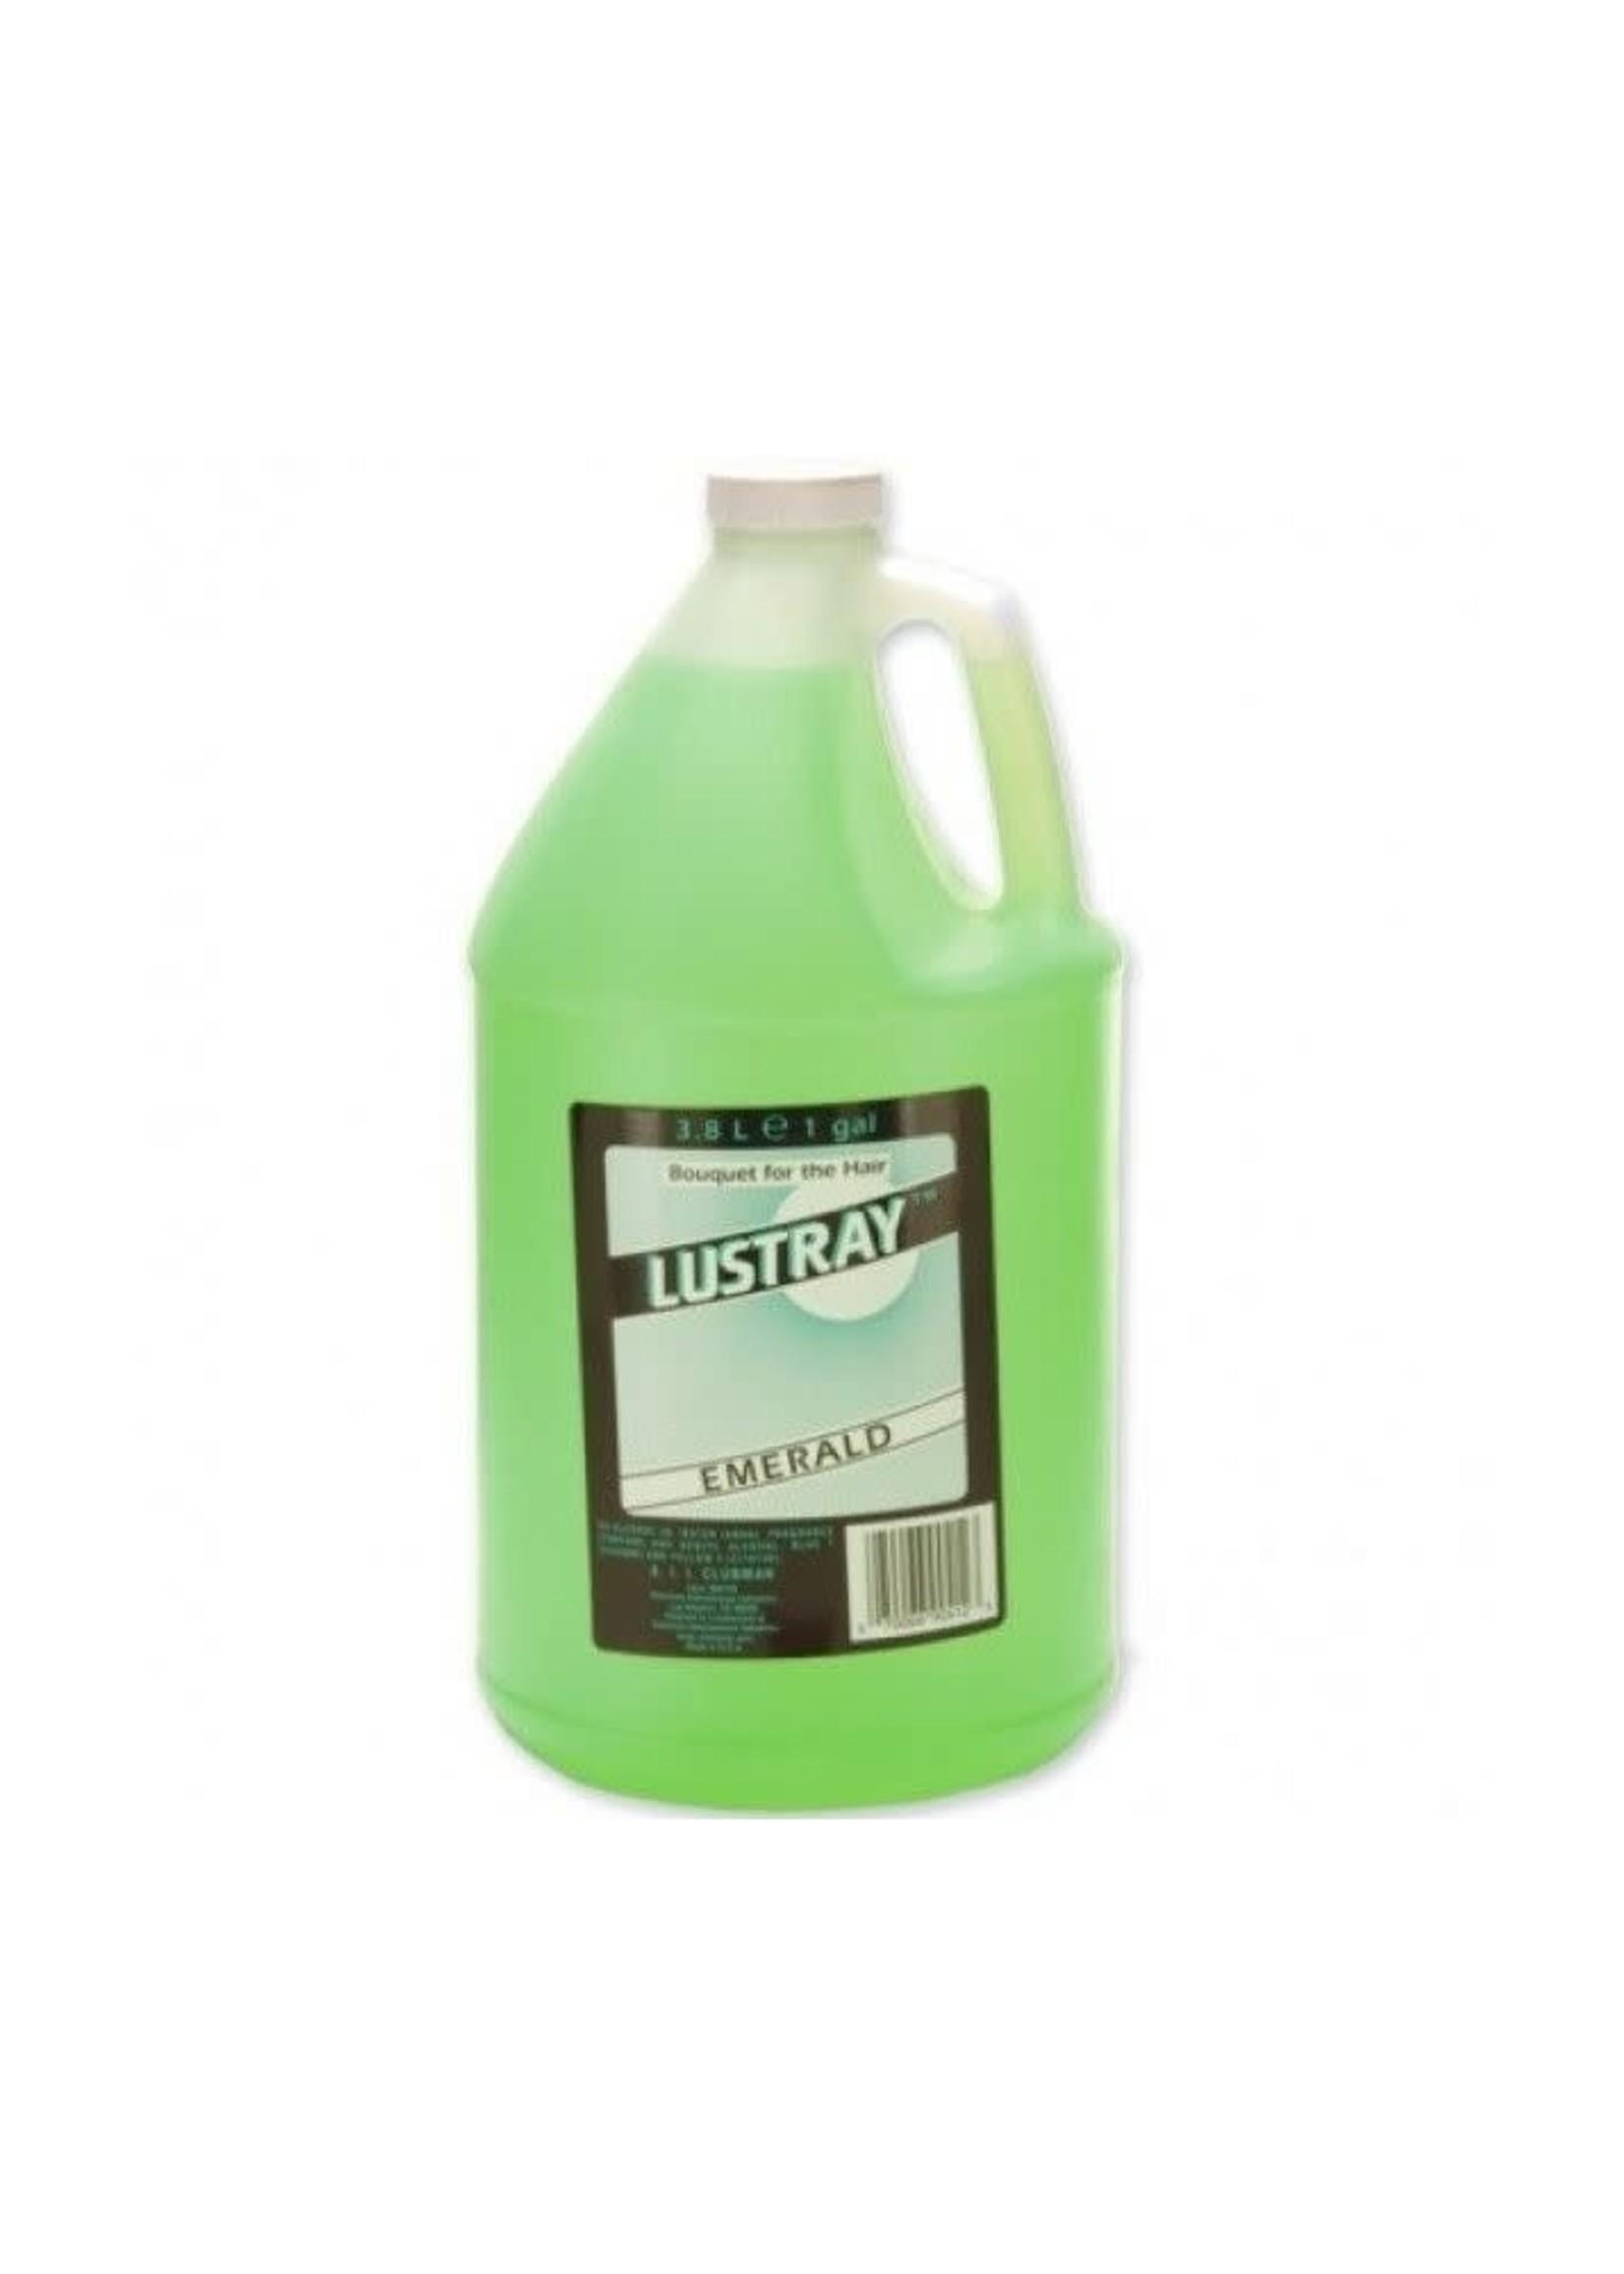 Clubman Lustray Emerald- 1 gallon